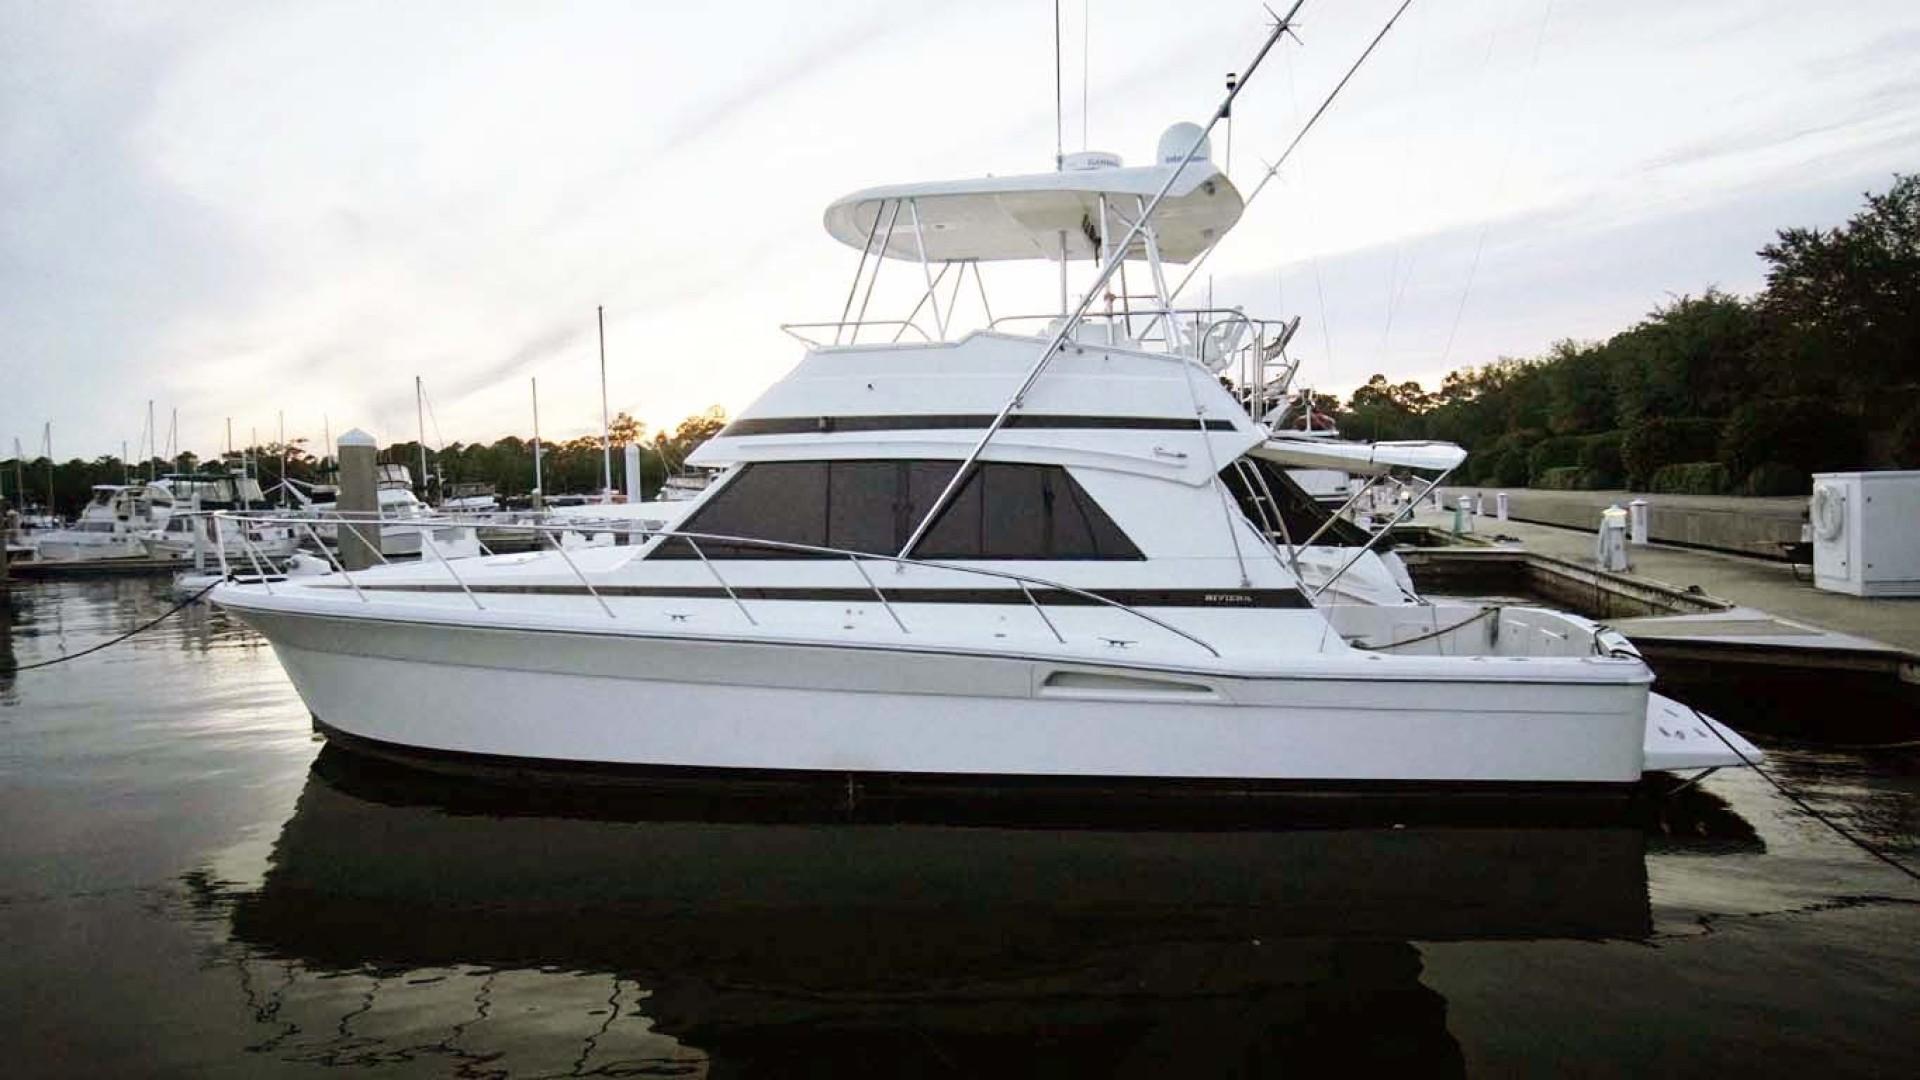 Riviera-43 Flybridge 2001-Sawbones Orange Beach-Alabama-United States-Riviera 43 FB Convertible-1413438   Thumbnail